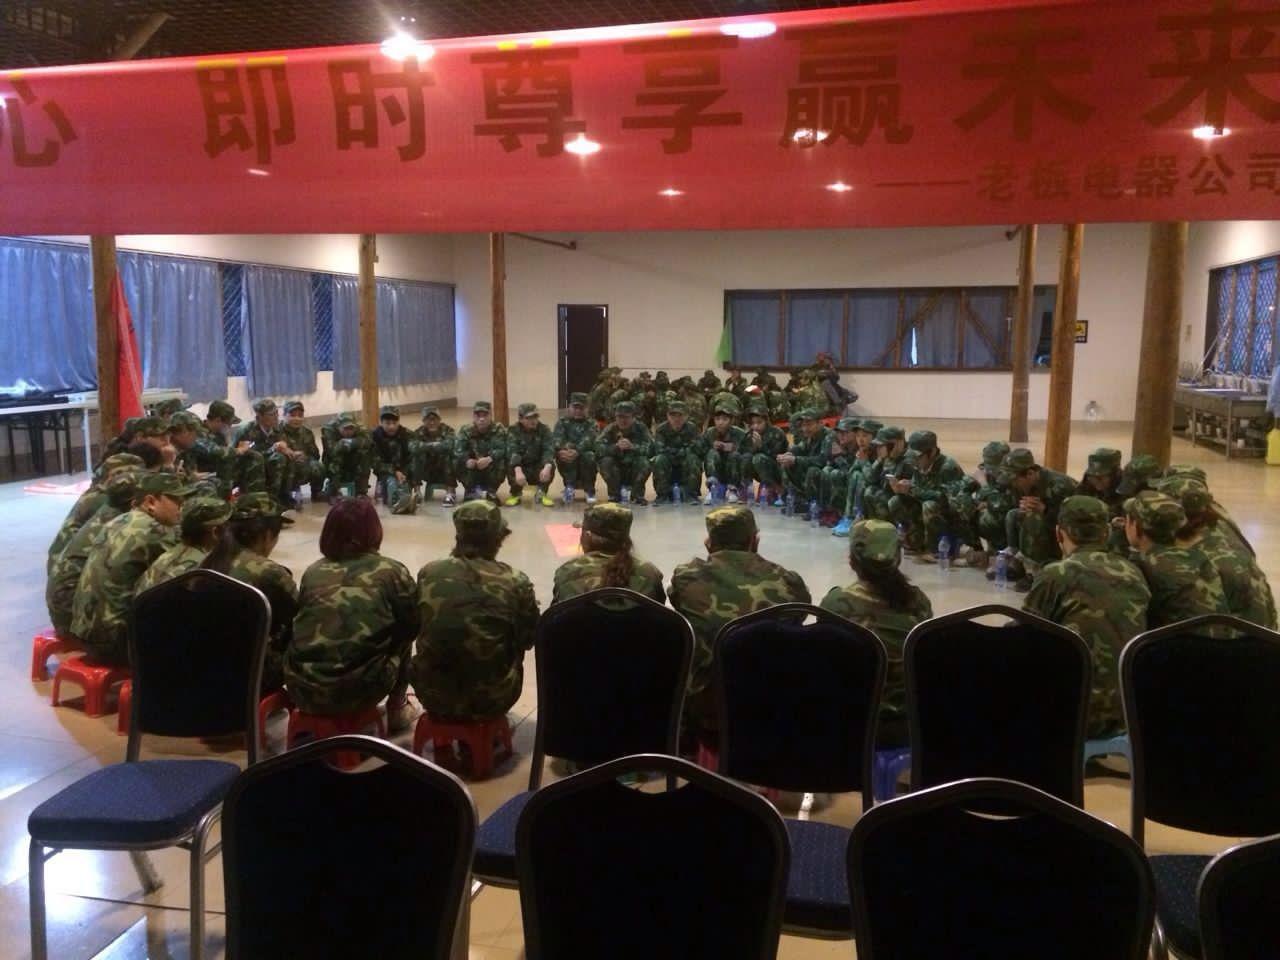 news-Ying Jia Baili, Ying Ying to join the Whampoa Military Academy of military training-WINPAI-img-1